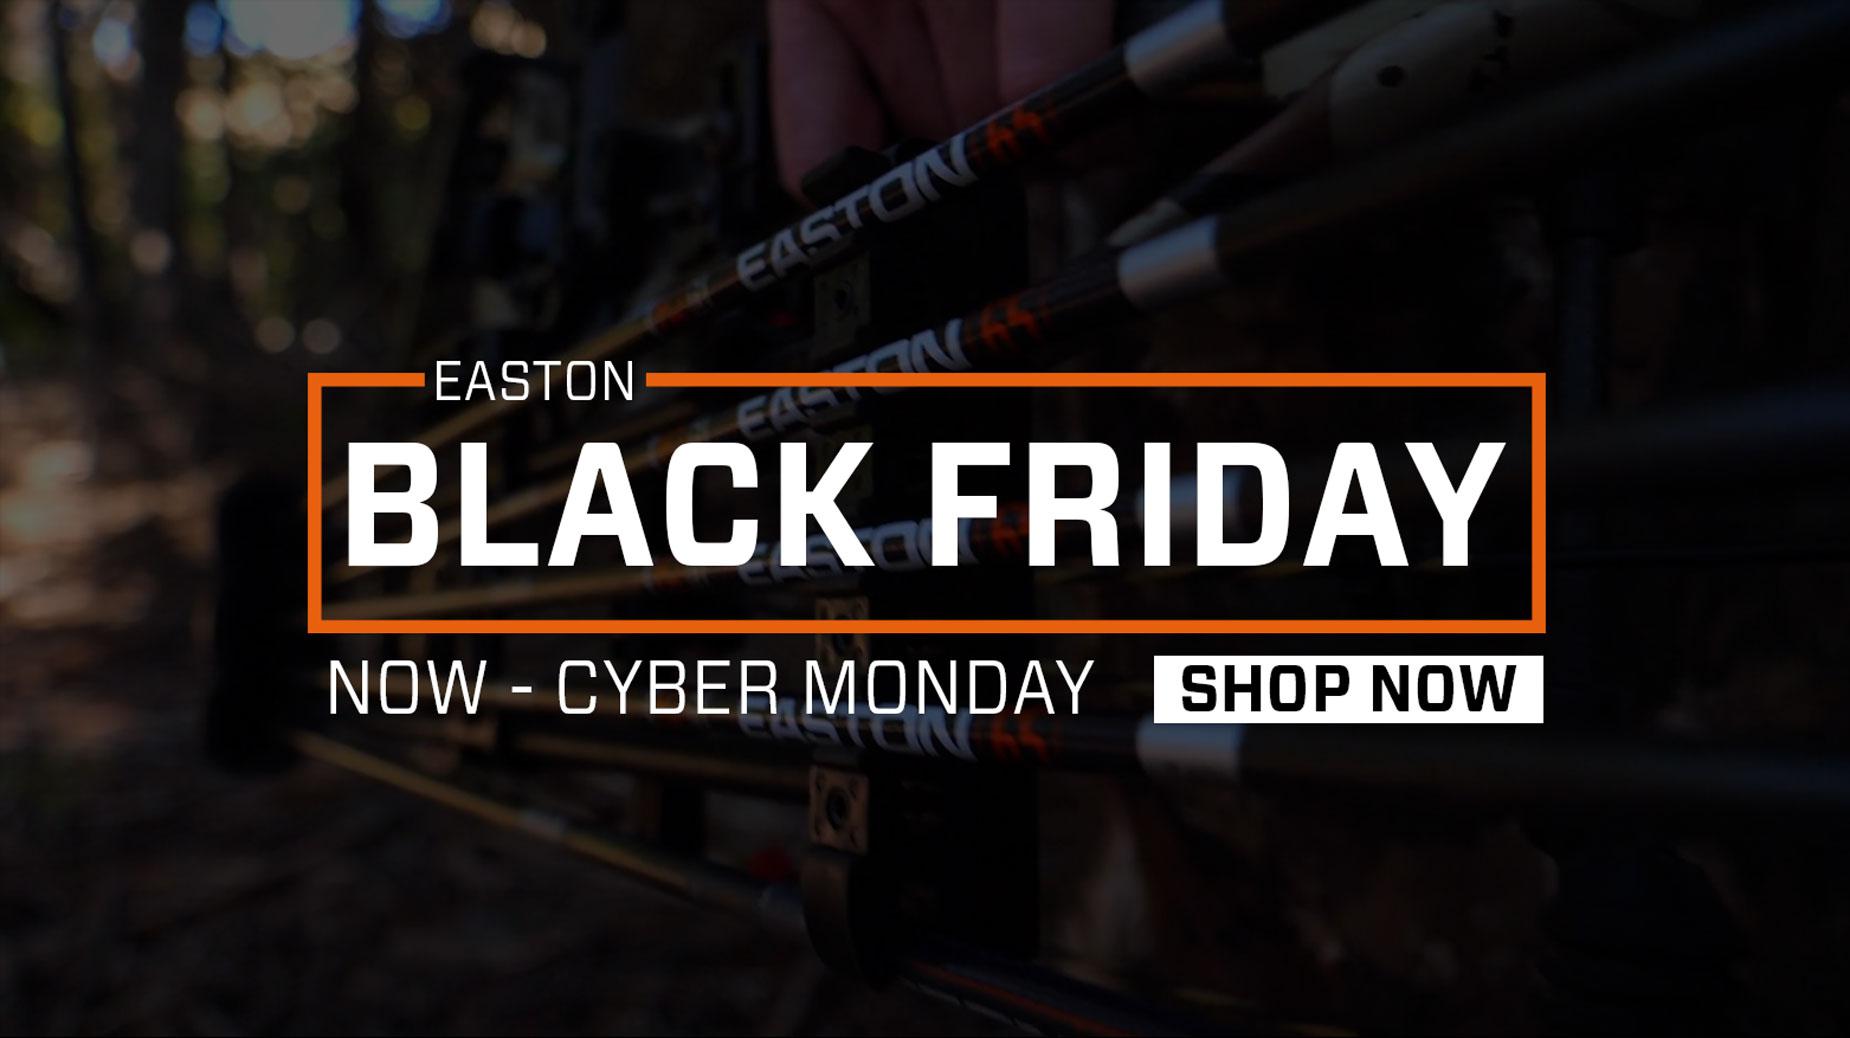 Easton Black Friday